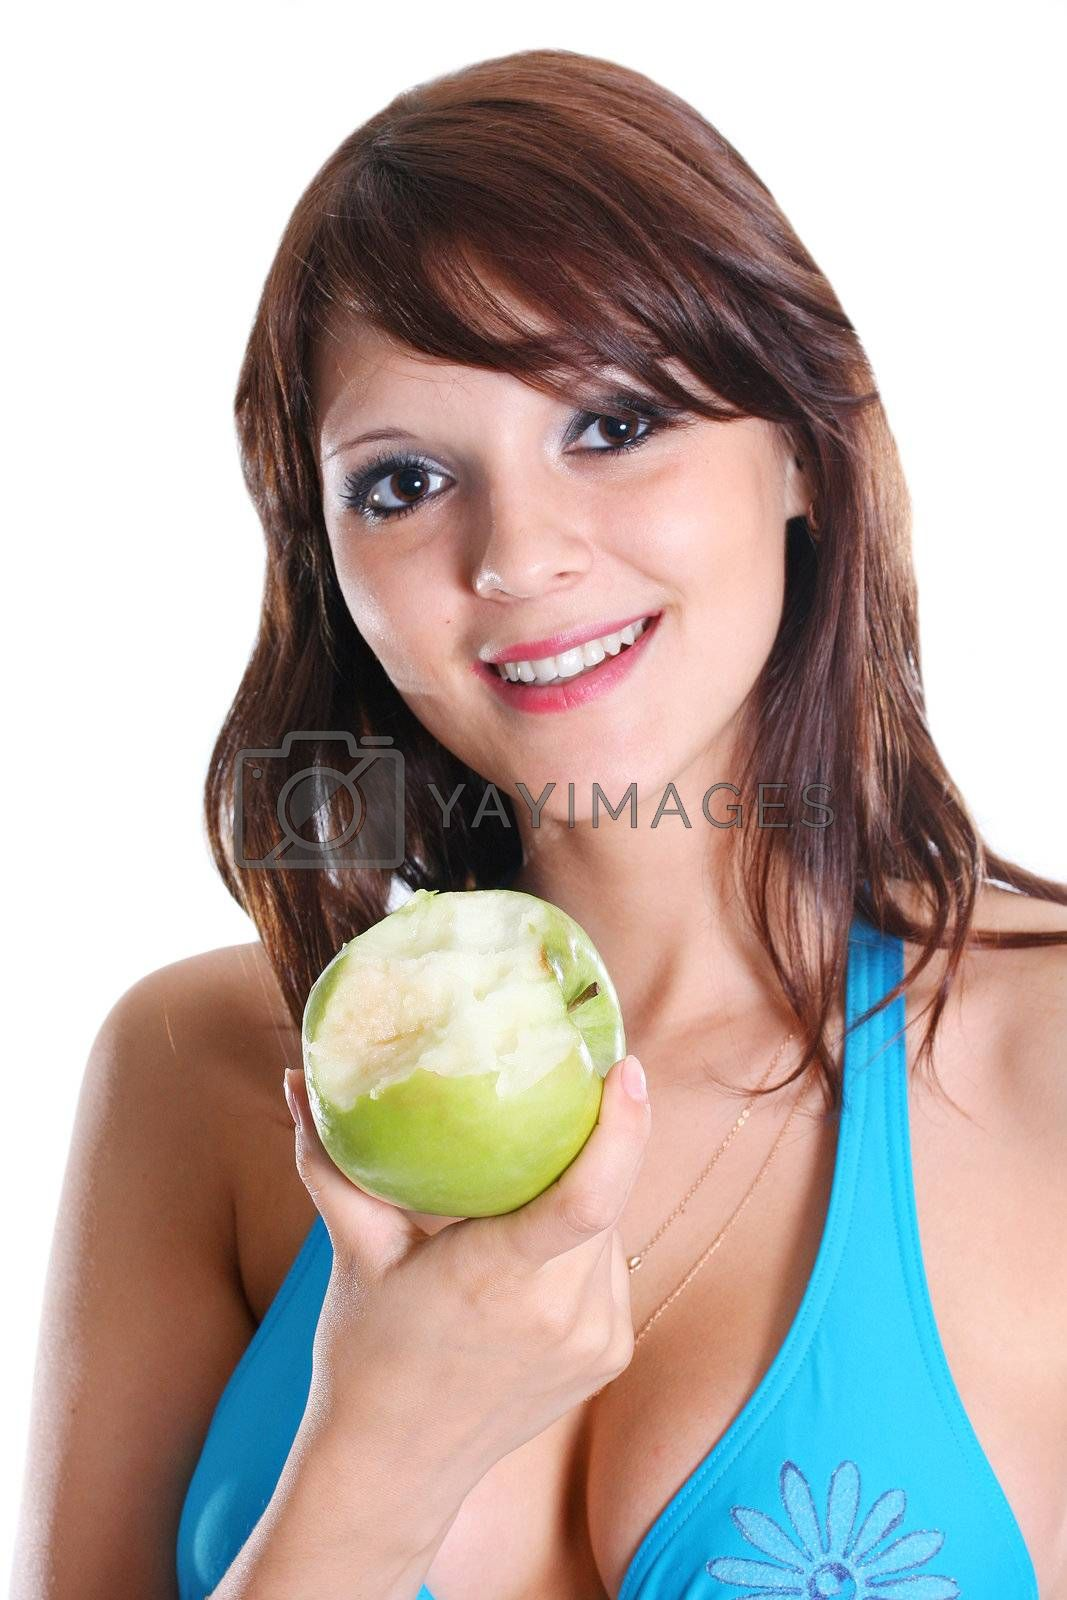 sporty diet wellness glamour beauty bikini young